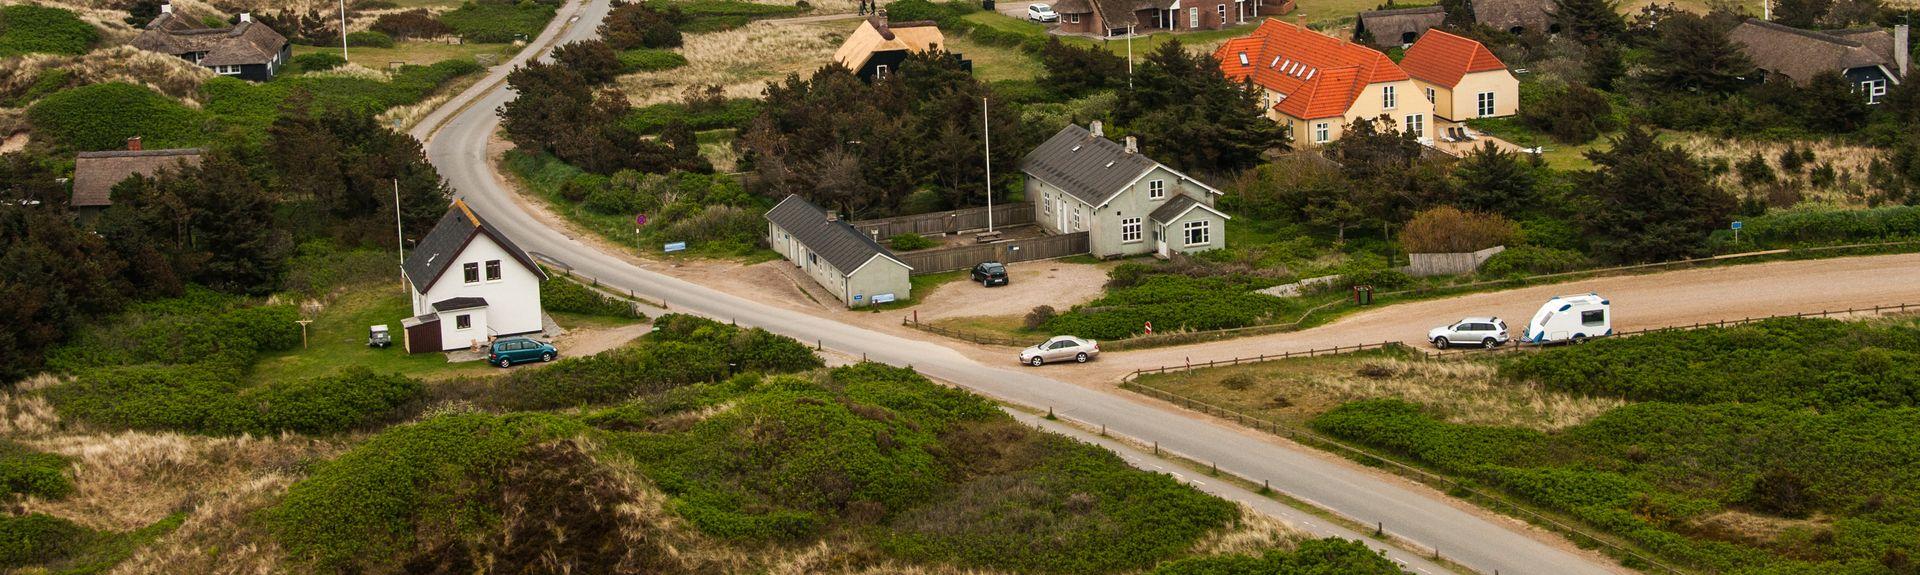 Blåvand, Syddanmark, Danmark